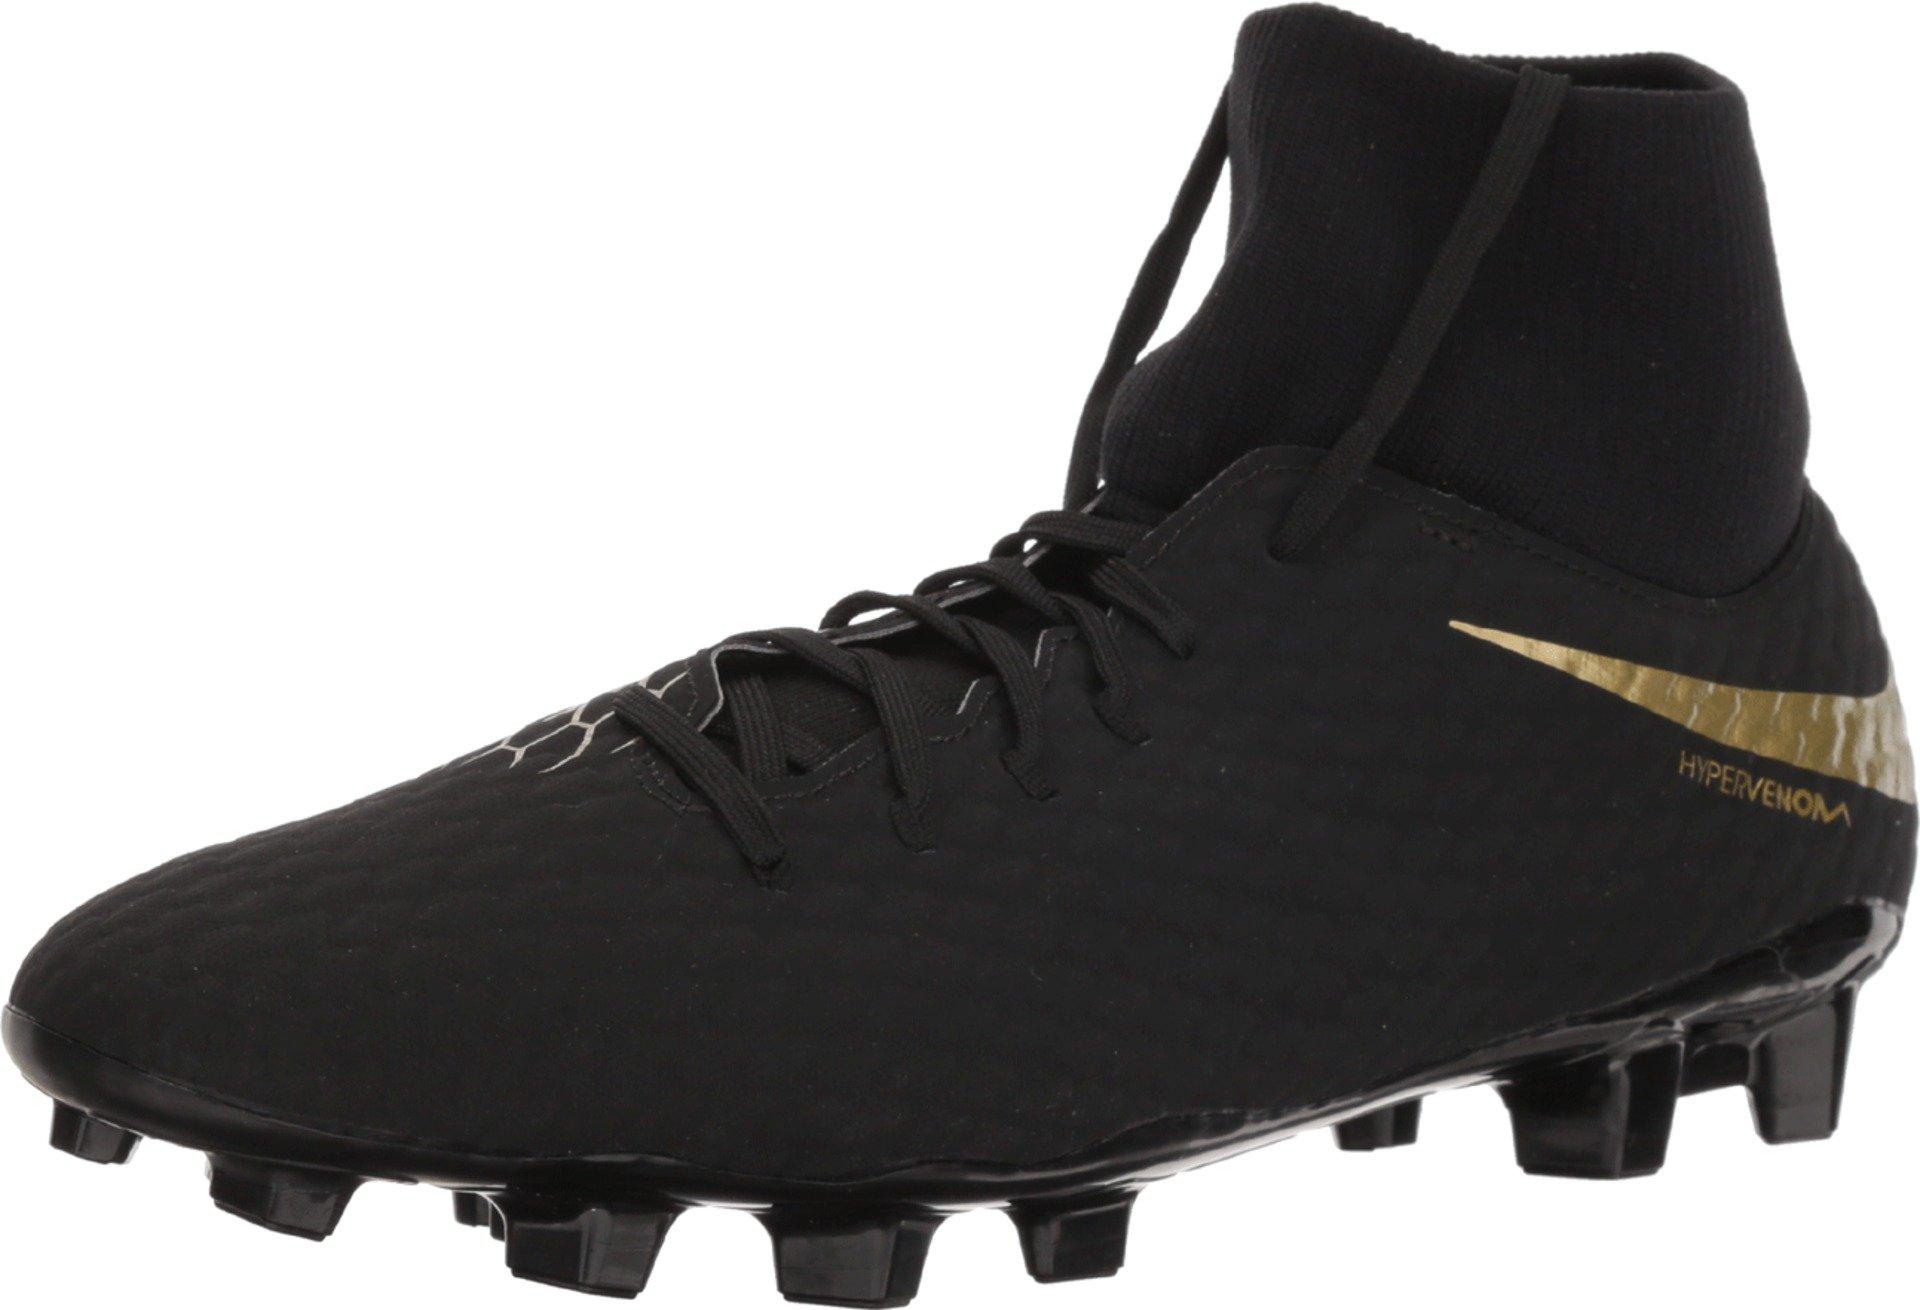 NIKE Hypervenom Phantom 3 Academy Dynamic Fit FG Soccer Cleats (6.5, Black/Gold)